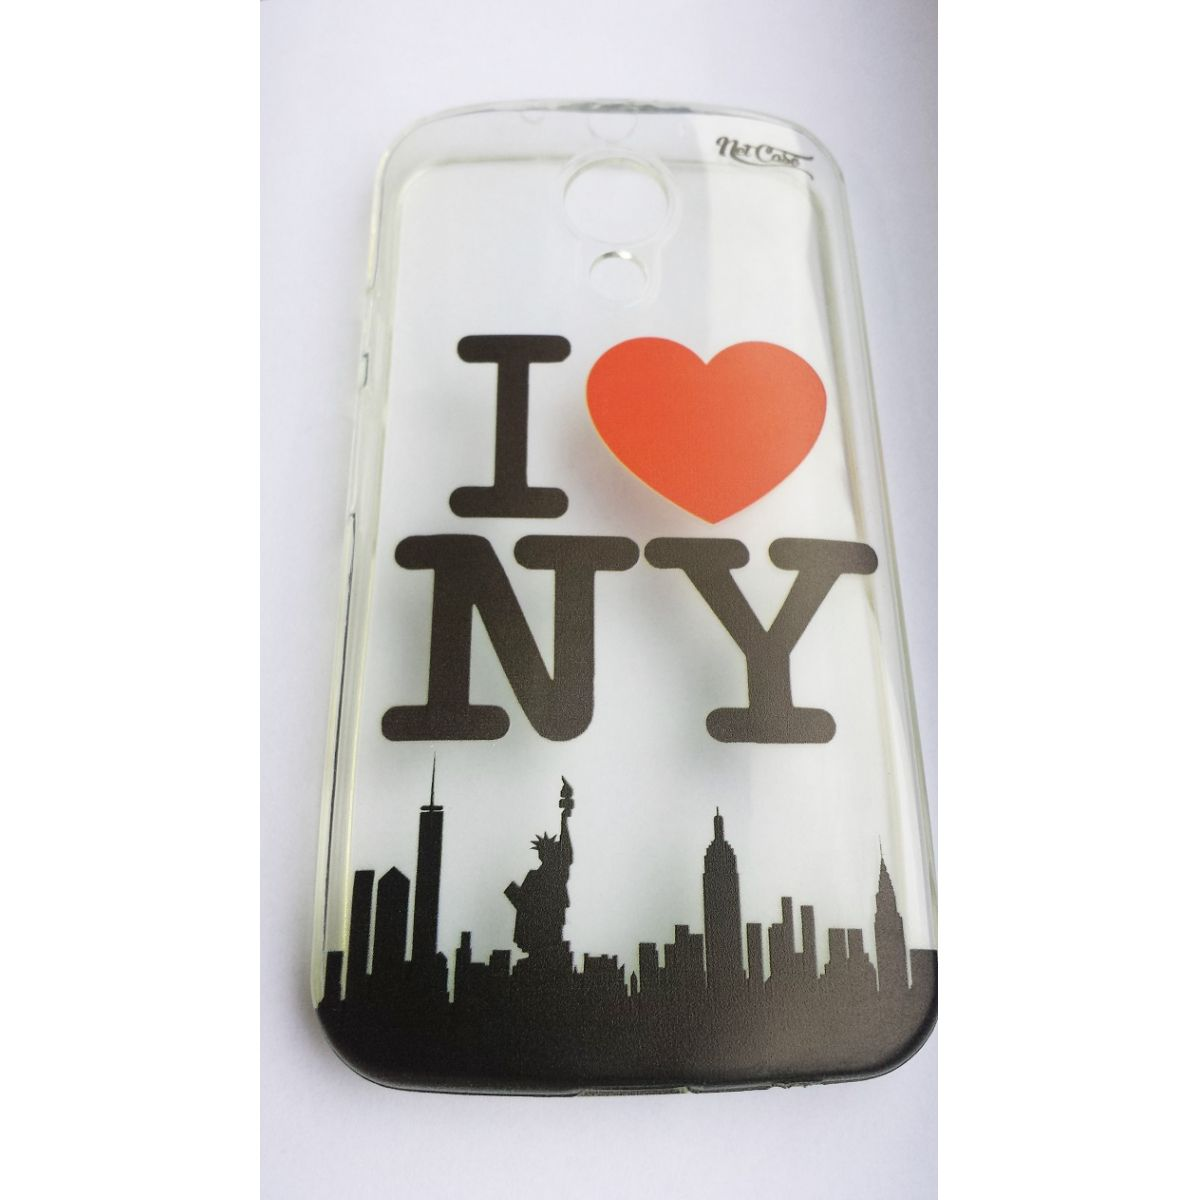 Capa Motorola Moto G2 New York 2º Geração Xt1068 Xt1069